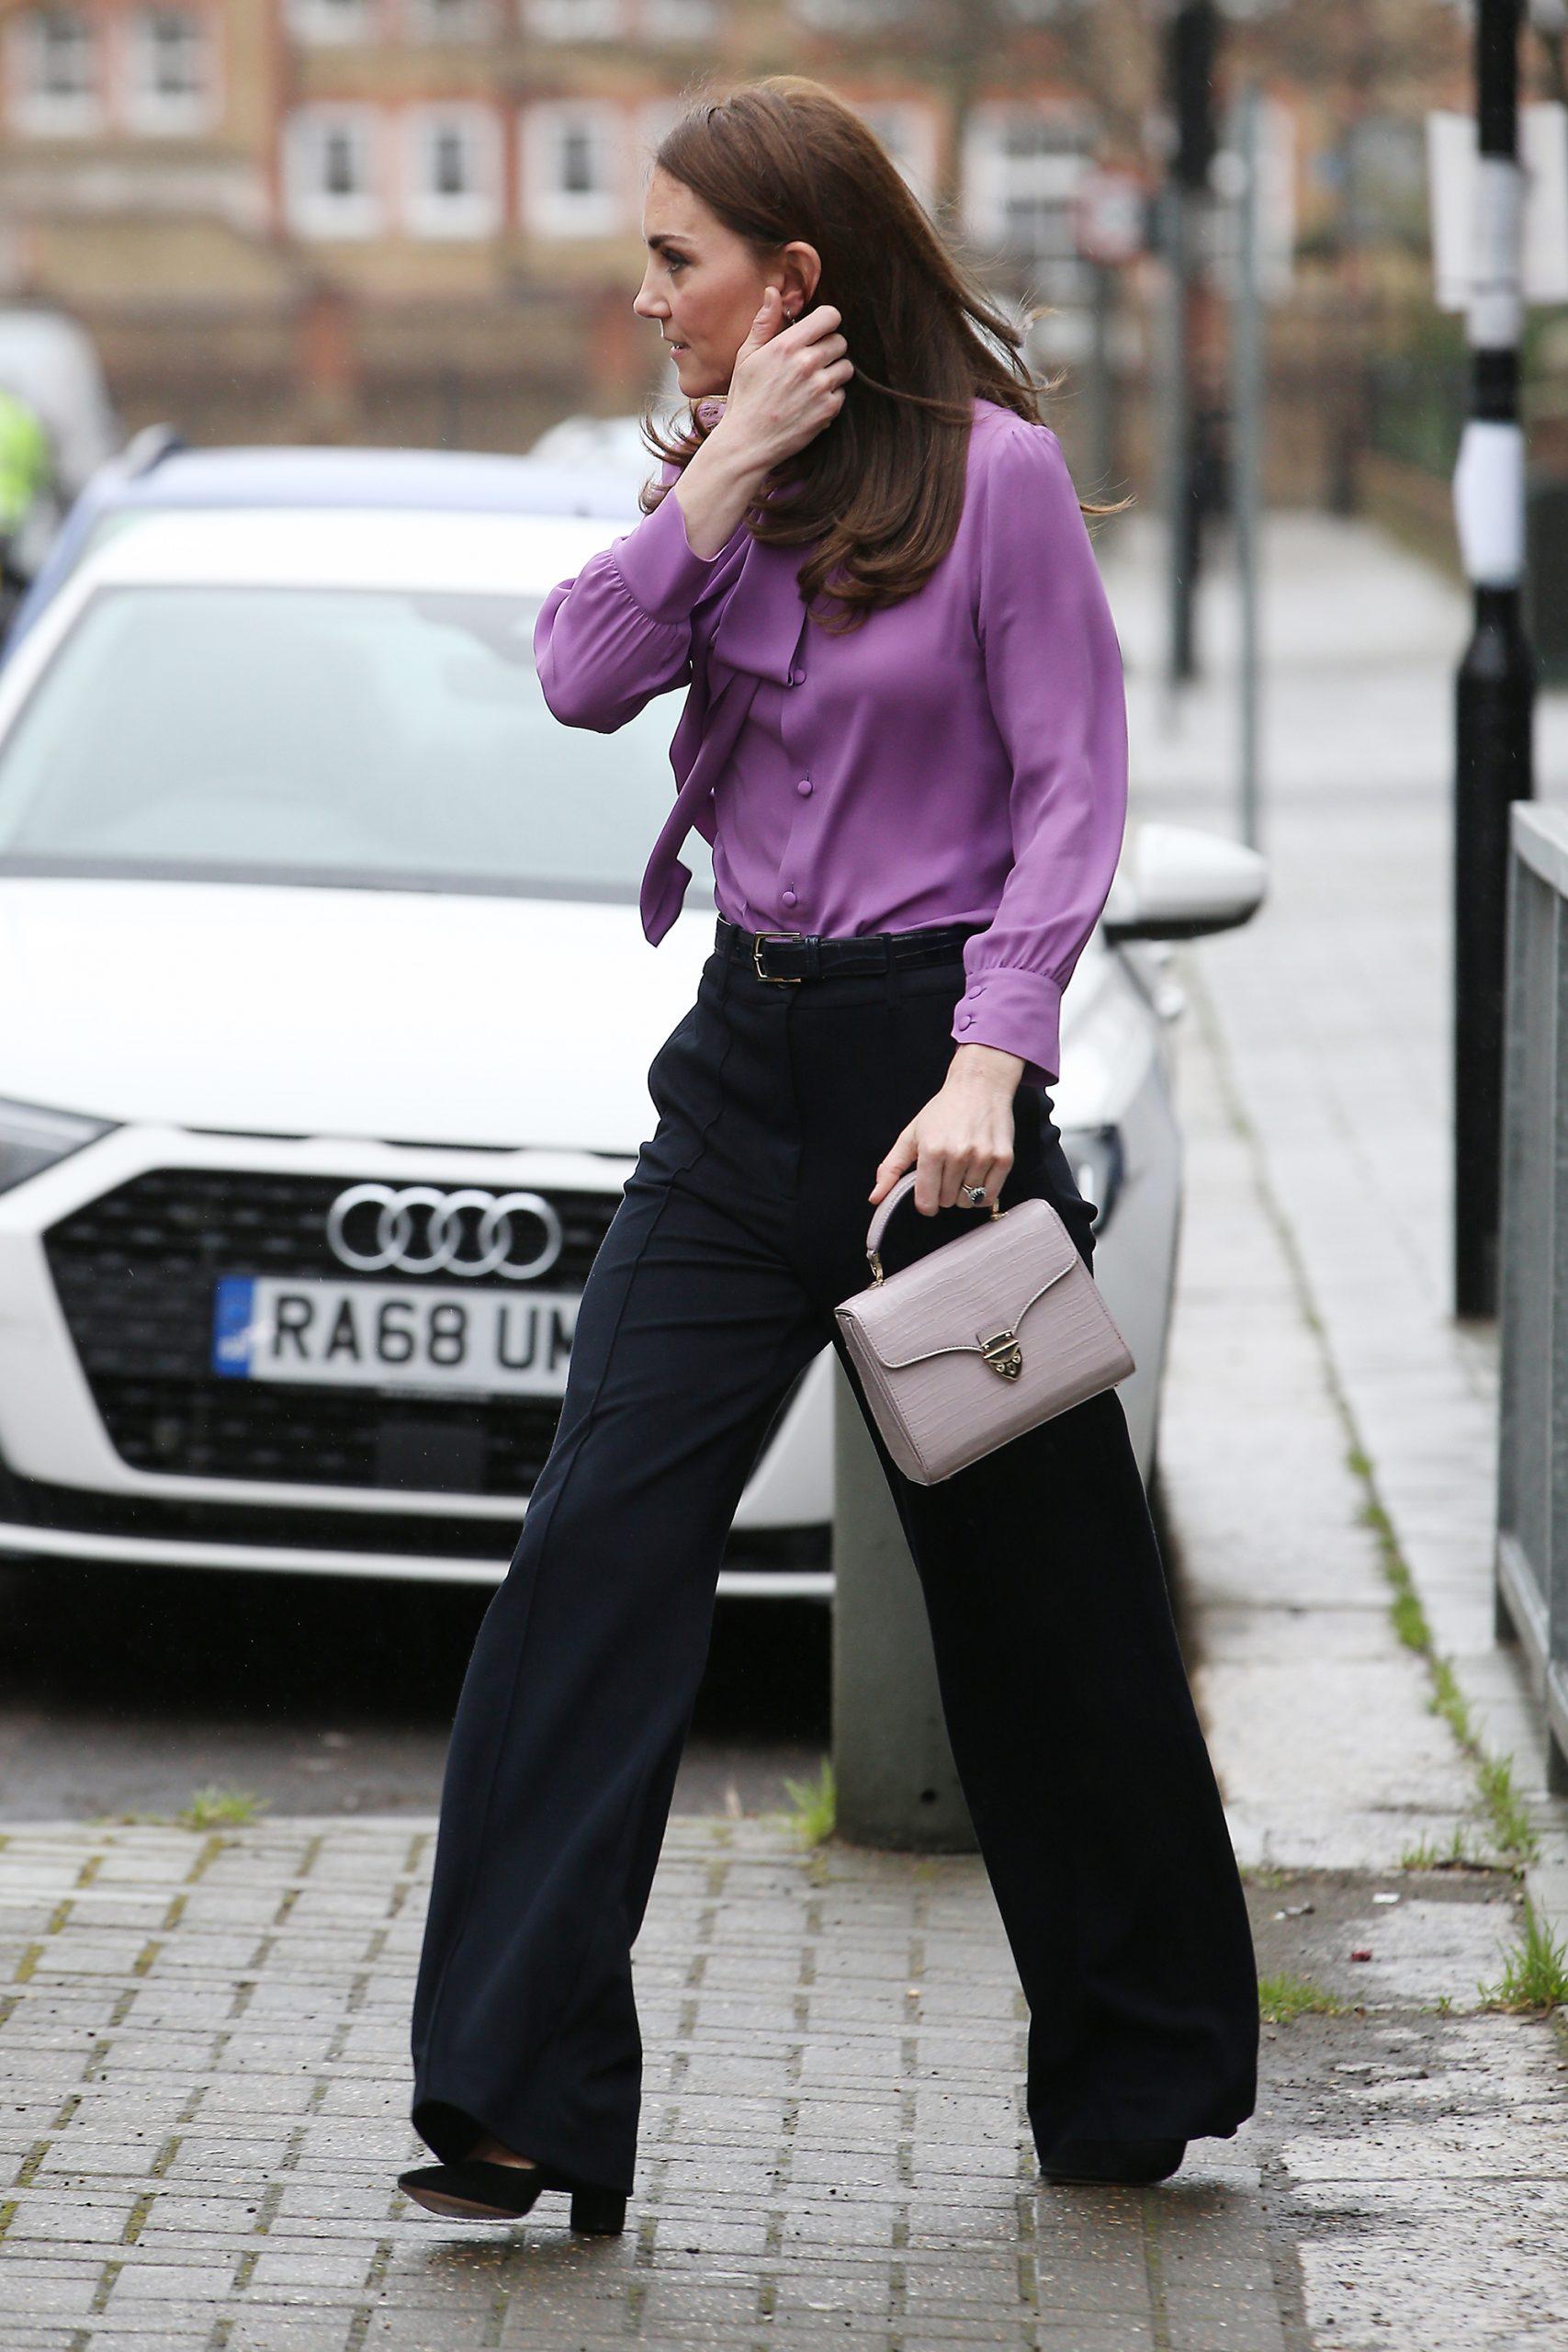 Katalin hercegné Gucci blúzban